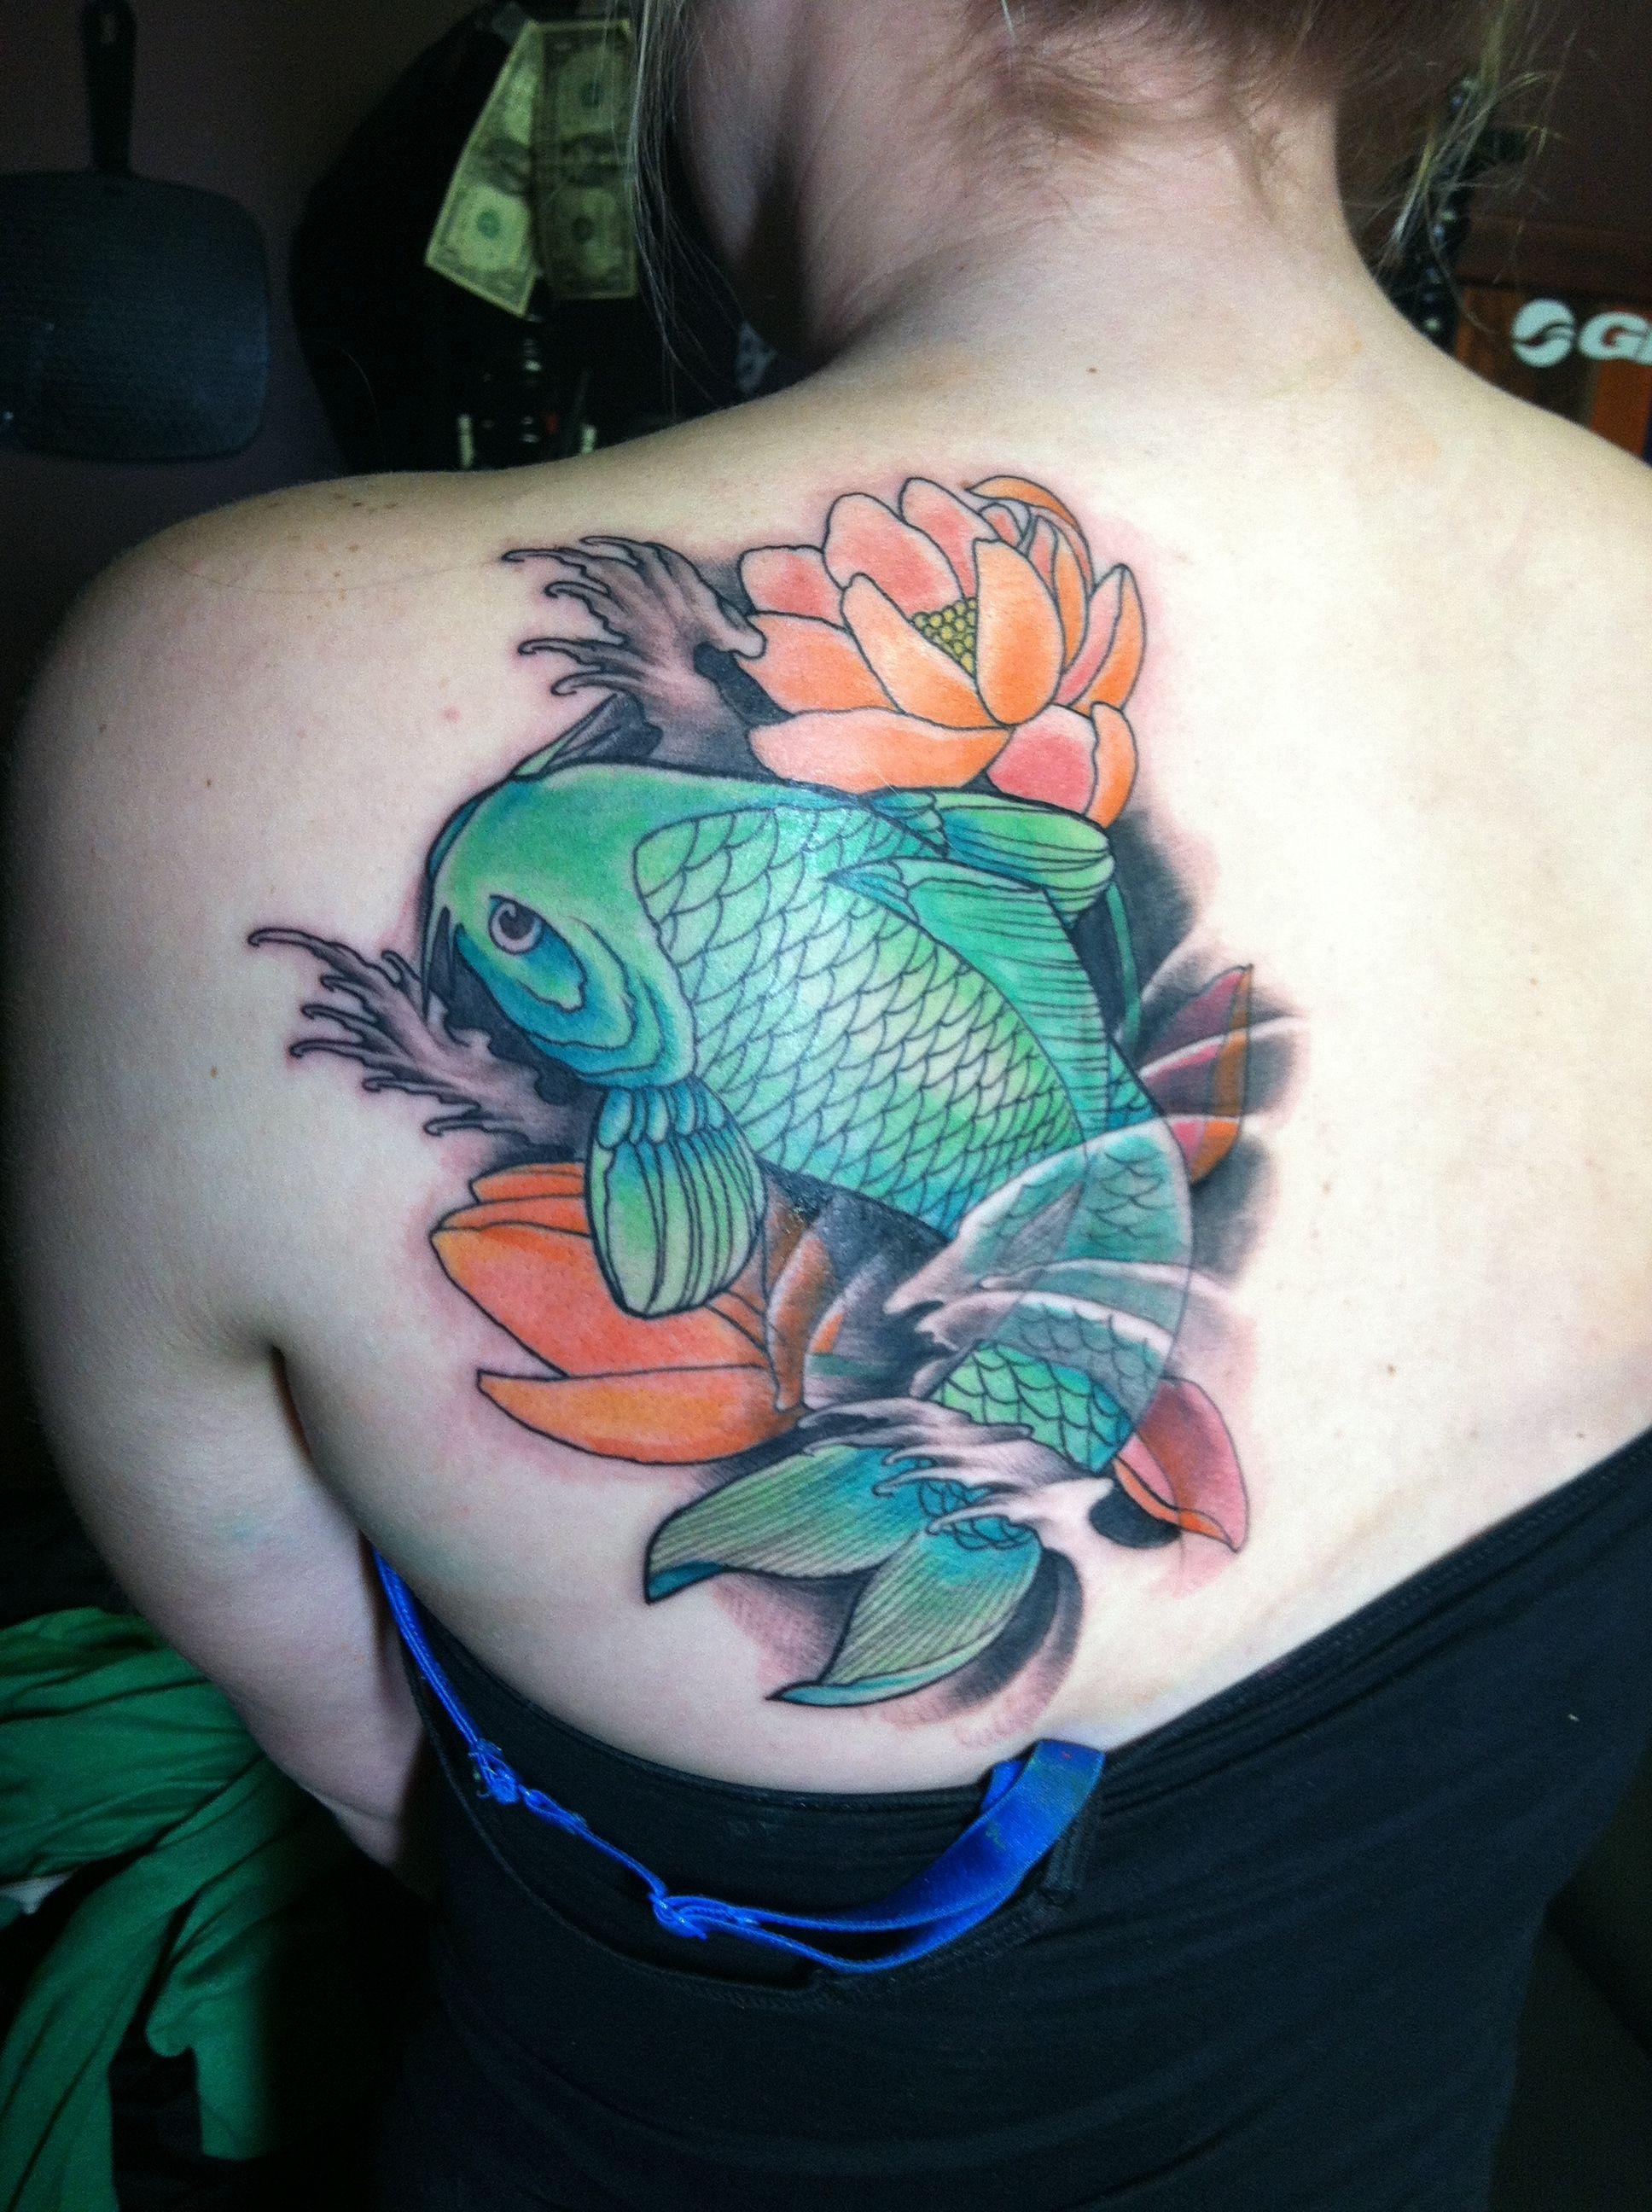 Small koi fish tattoo designs thumbs db for Small coy fish